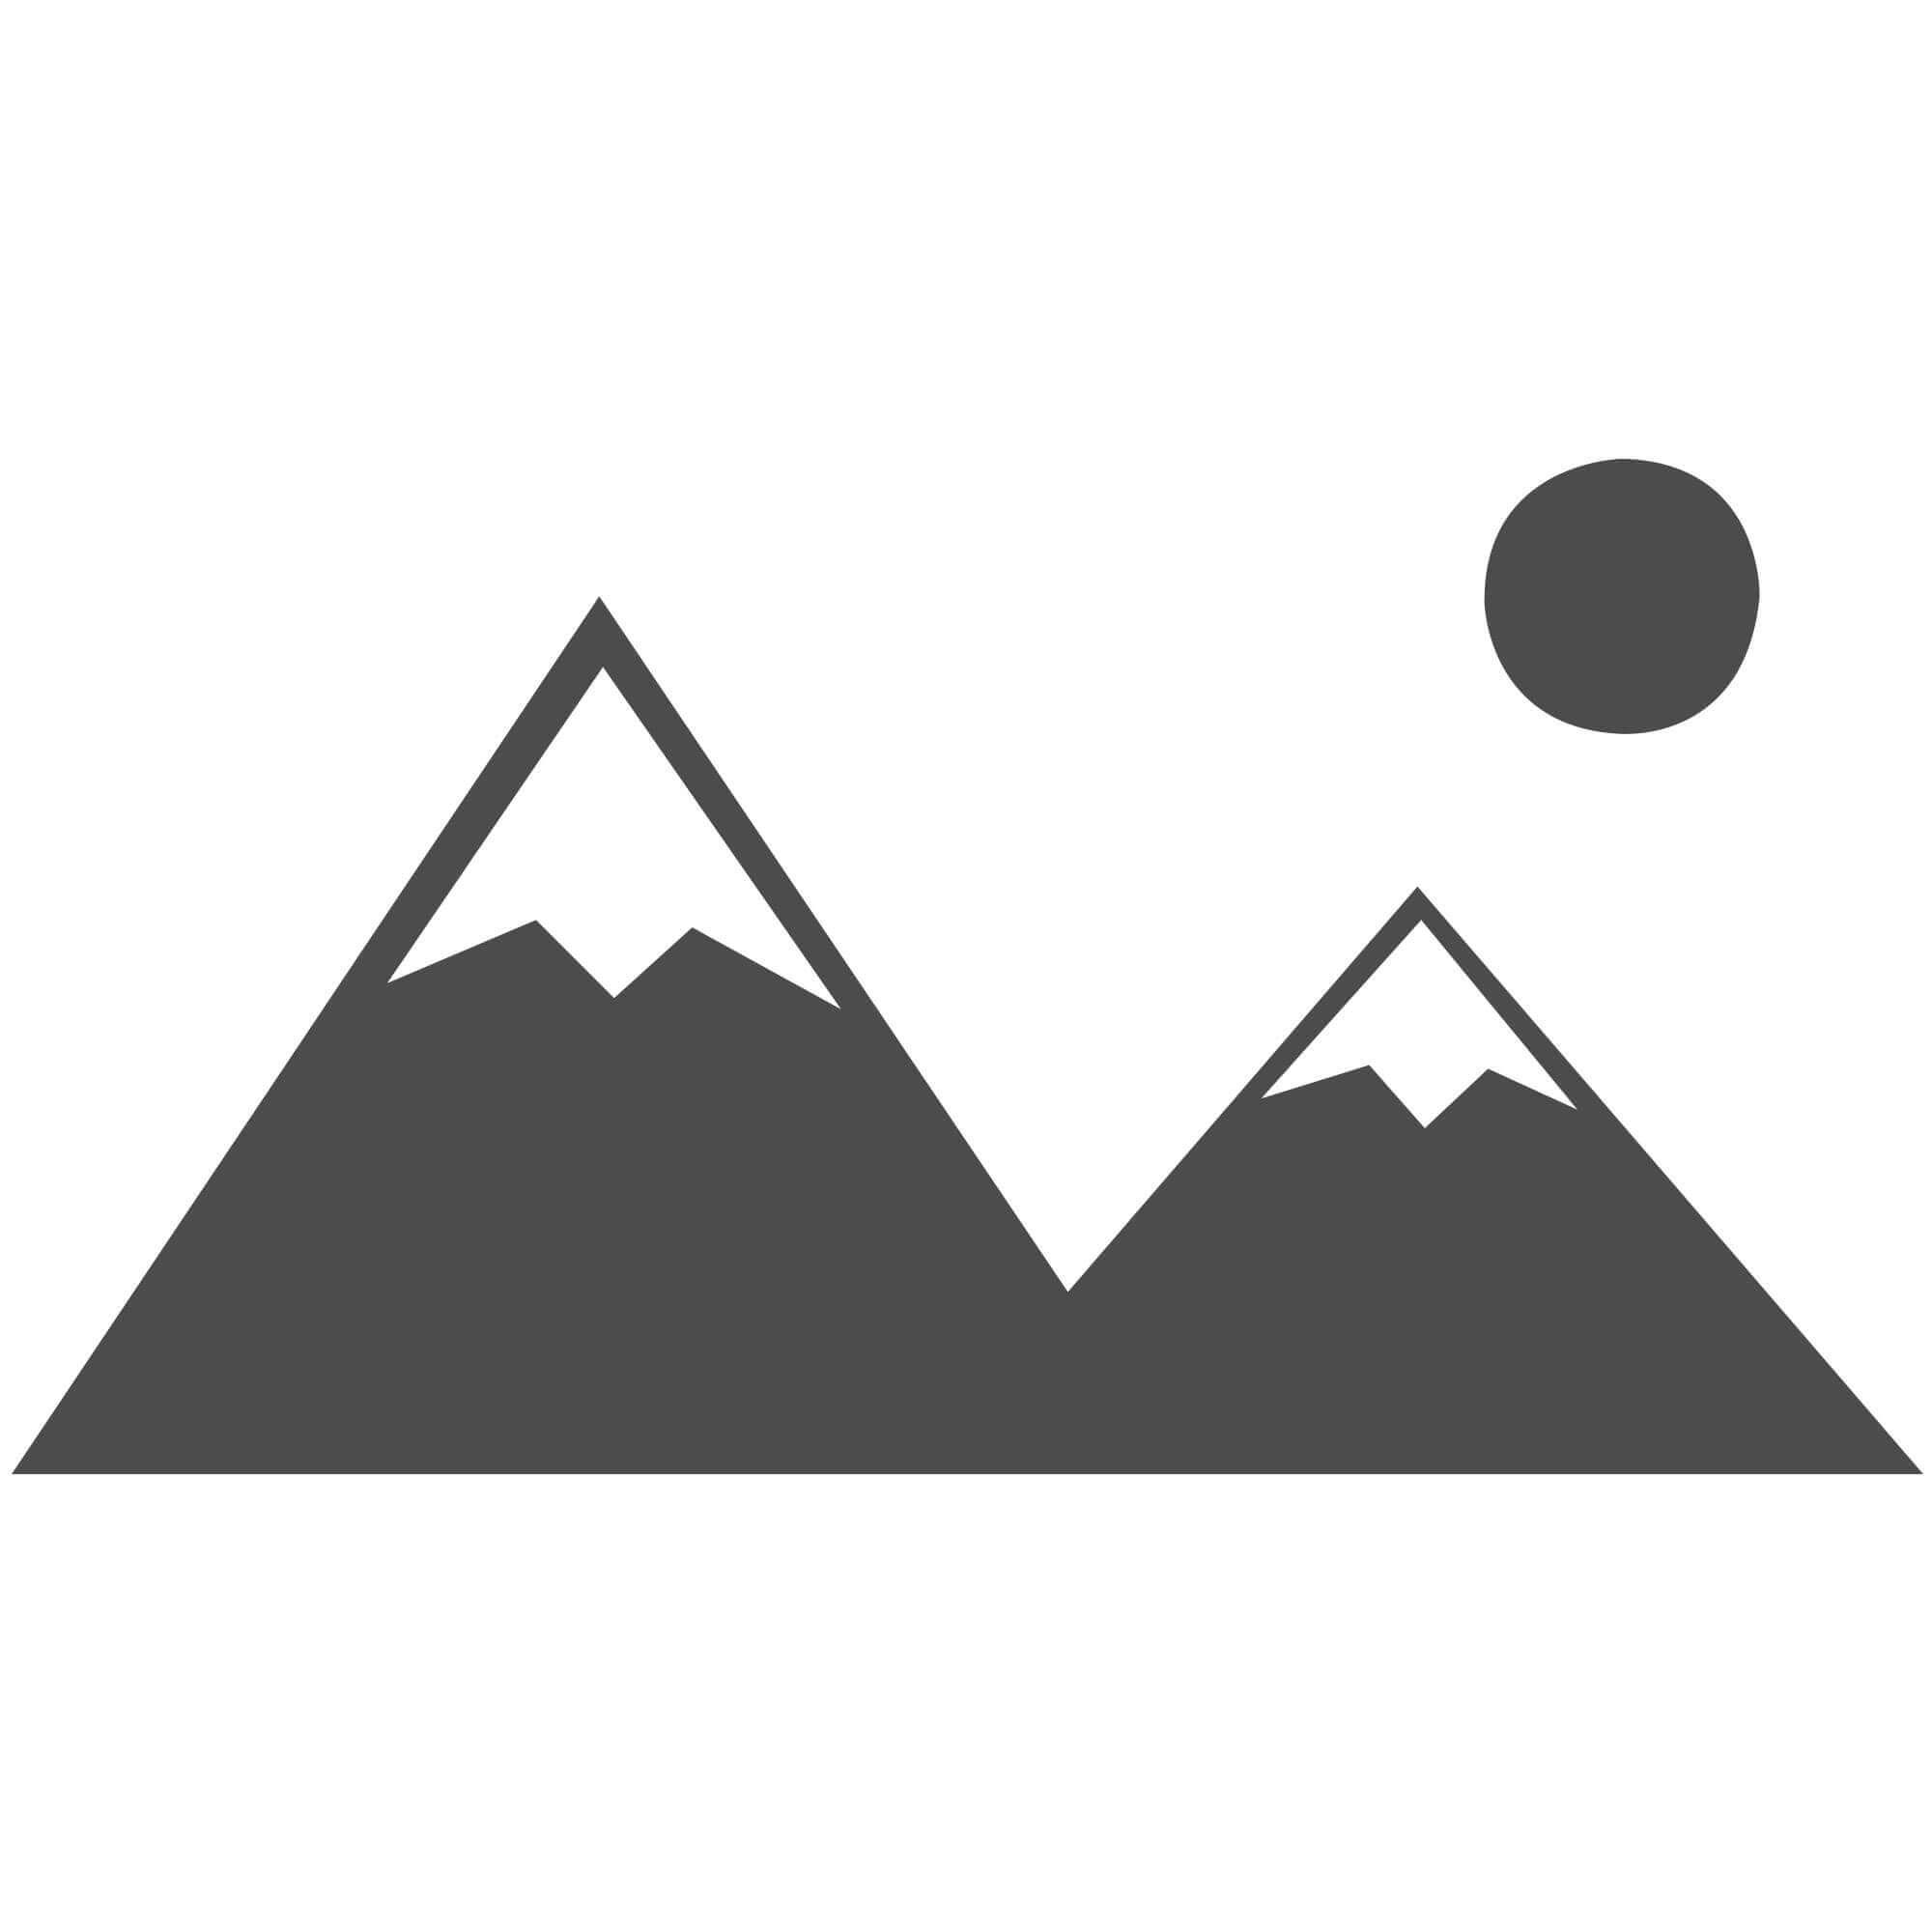 "Verge Furrow Terracotta Rug - Size 120 x 170 cm (4' x 5'7"")"